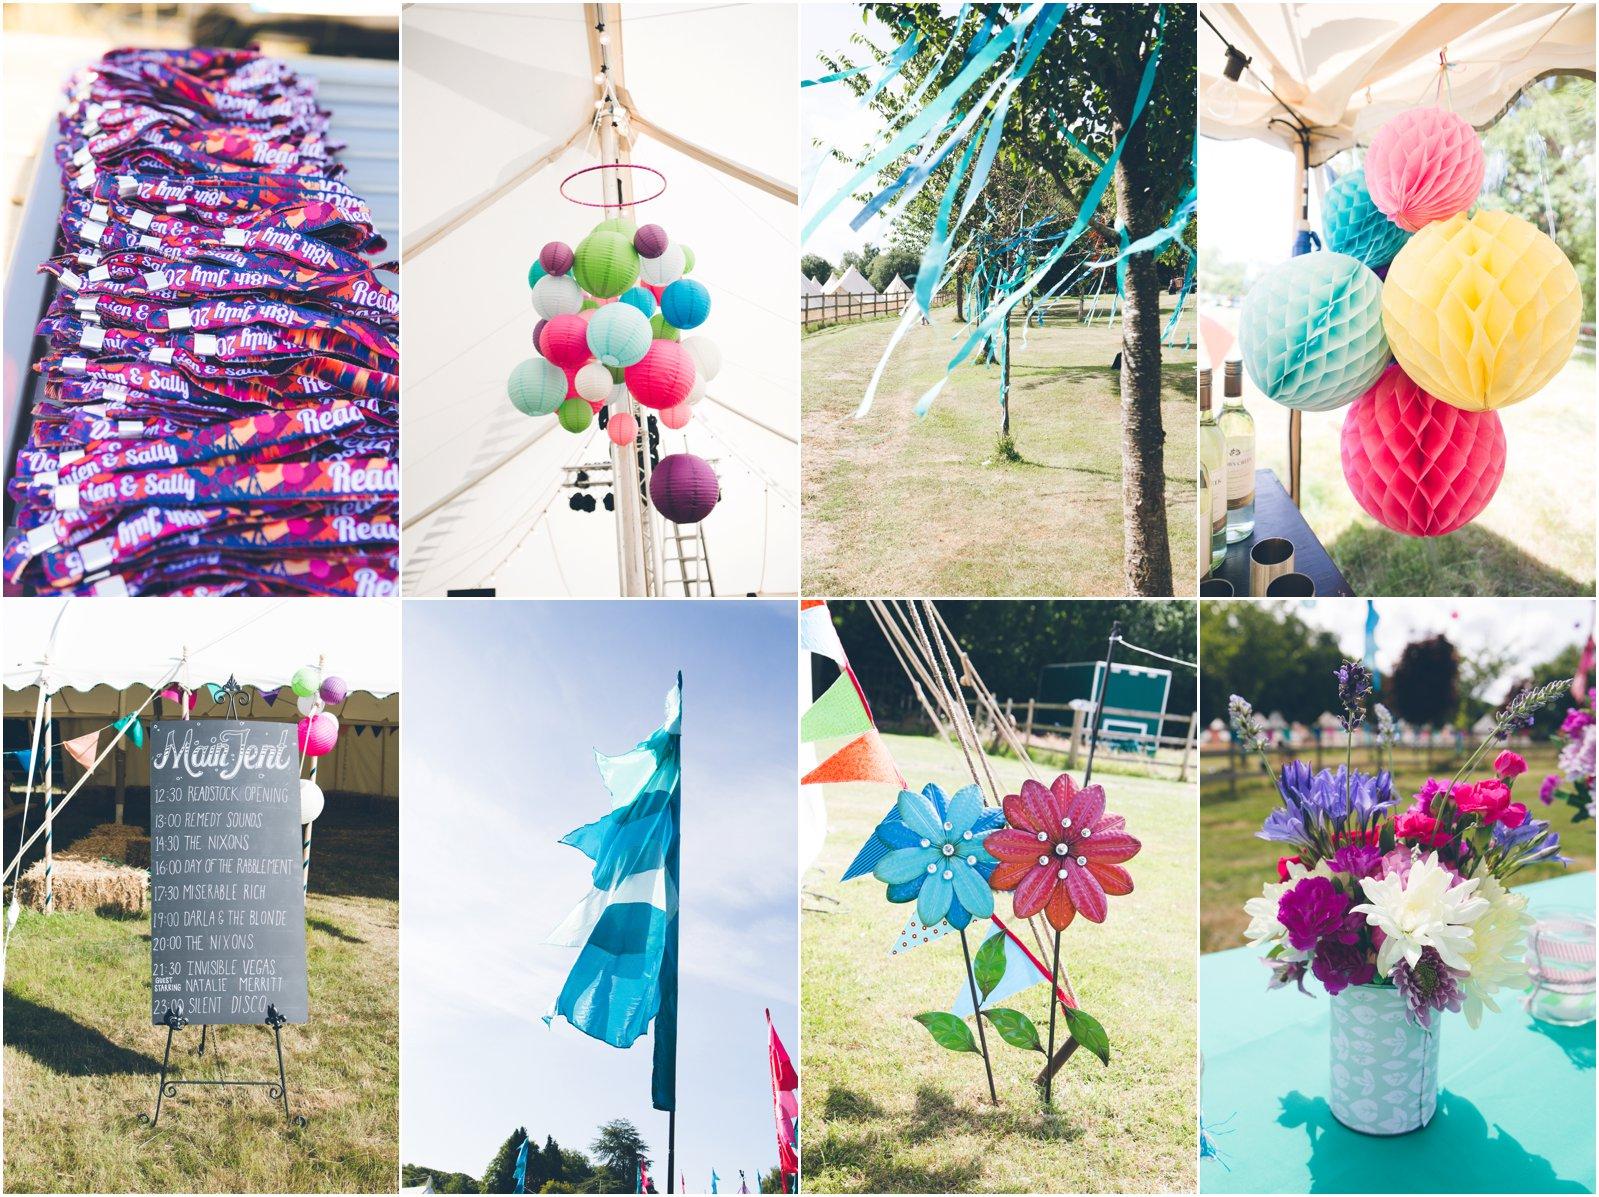 Sally and Damien's wedding festival by Summertown Pictures-5_DerrynSchmidt